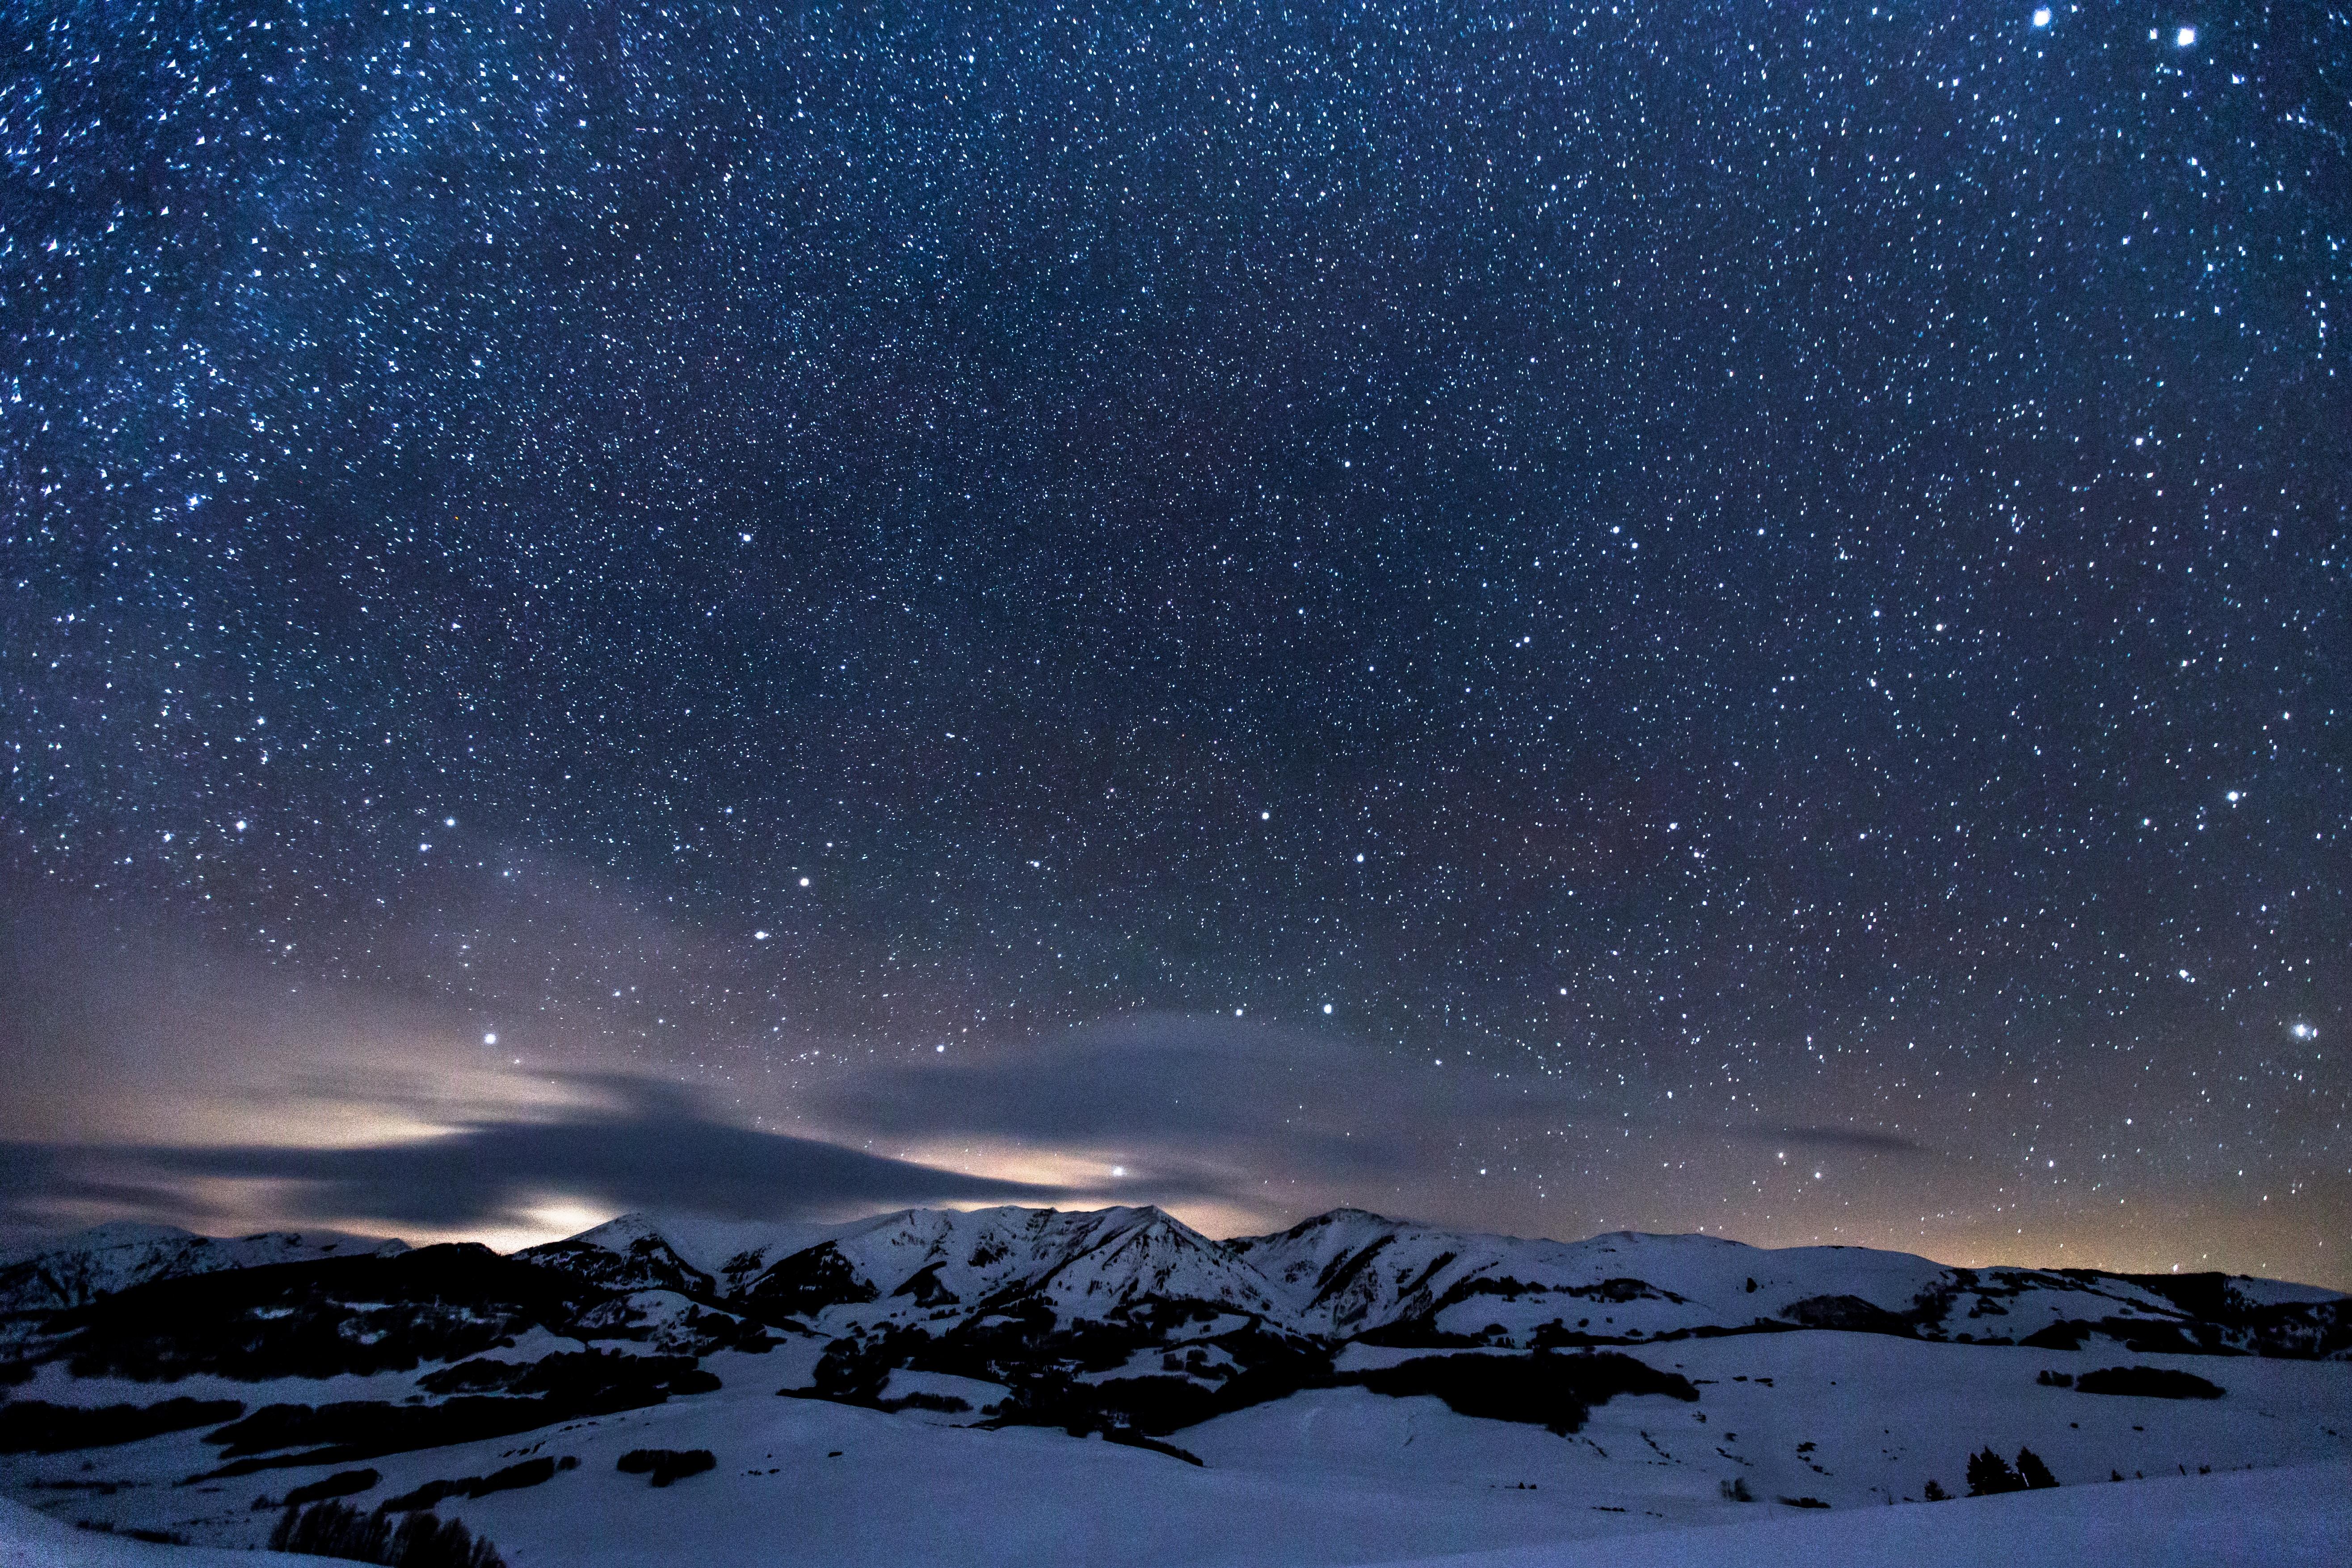 night sky with stars above snow landscape